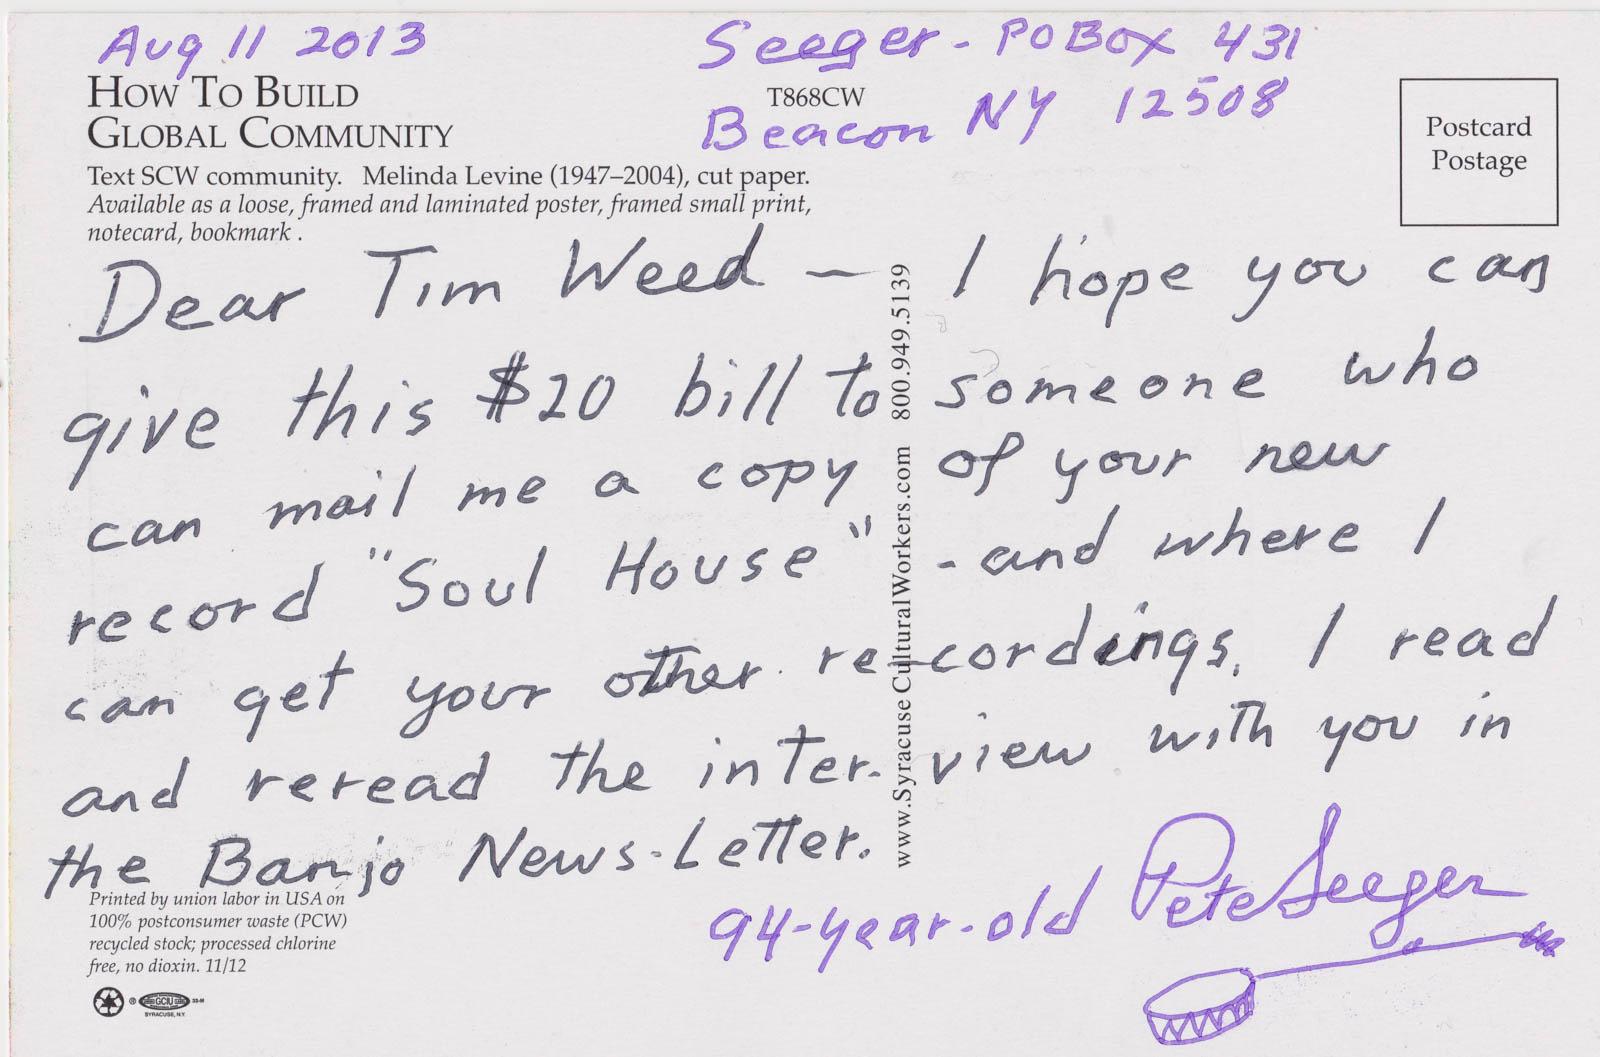 Pete Seeger Postcard